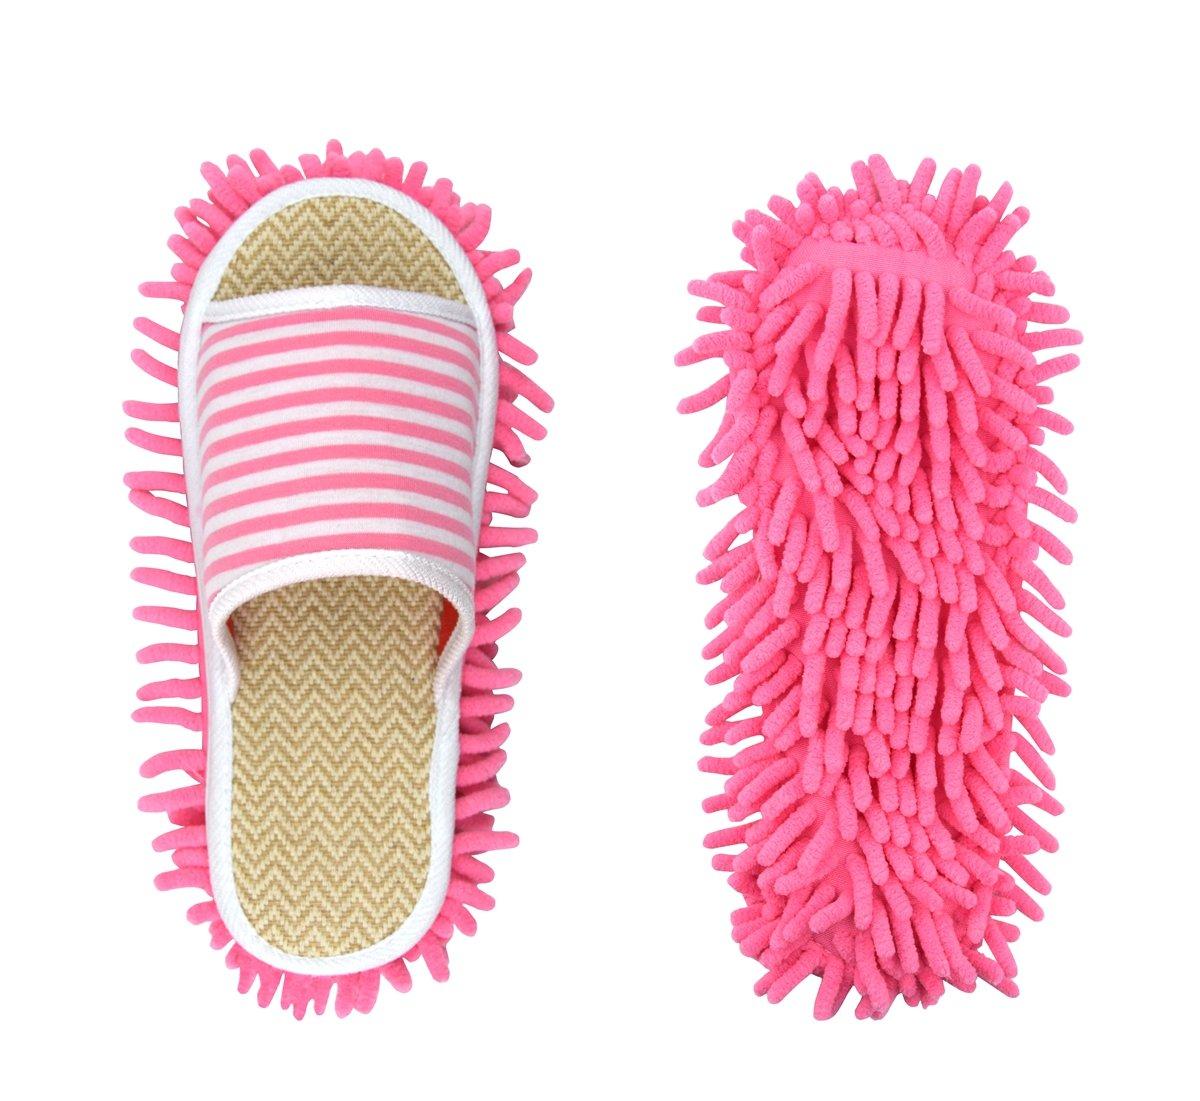 Unisex Microfiber Slippers Floor Cleaning Mop Men and Women House Dusting Slippers Floor Cleaning Tool (Cartoon Black, Women 7-10/Men5-8)